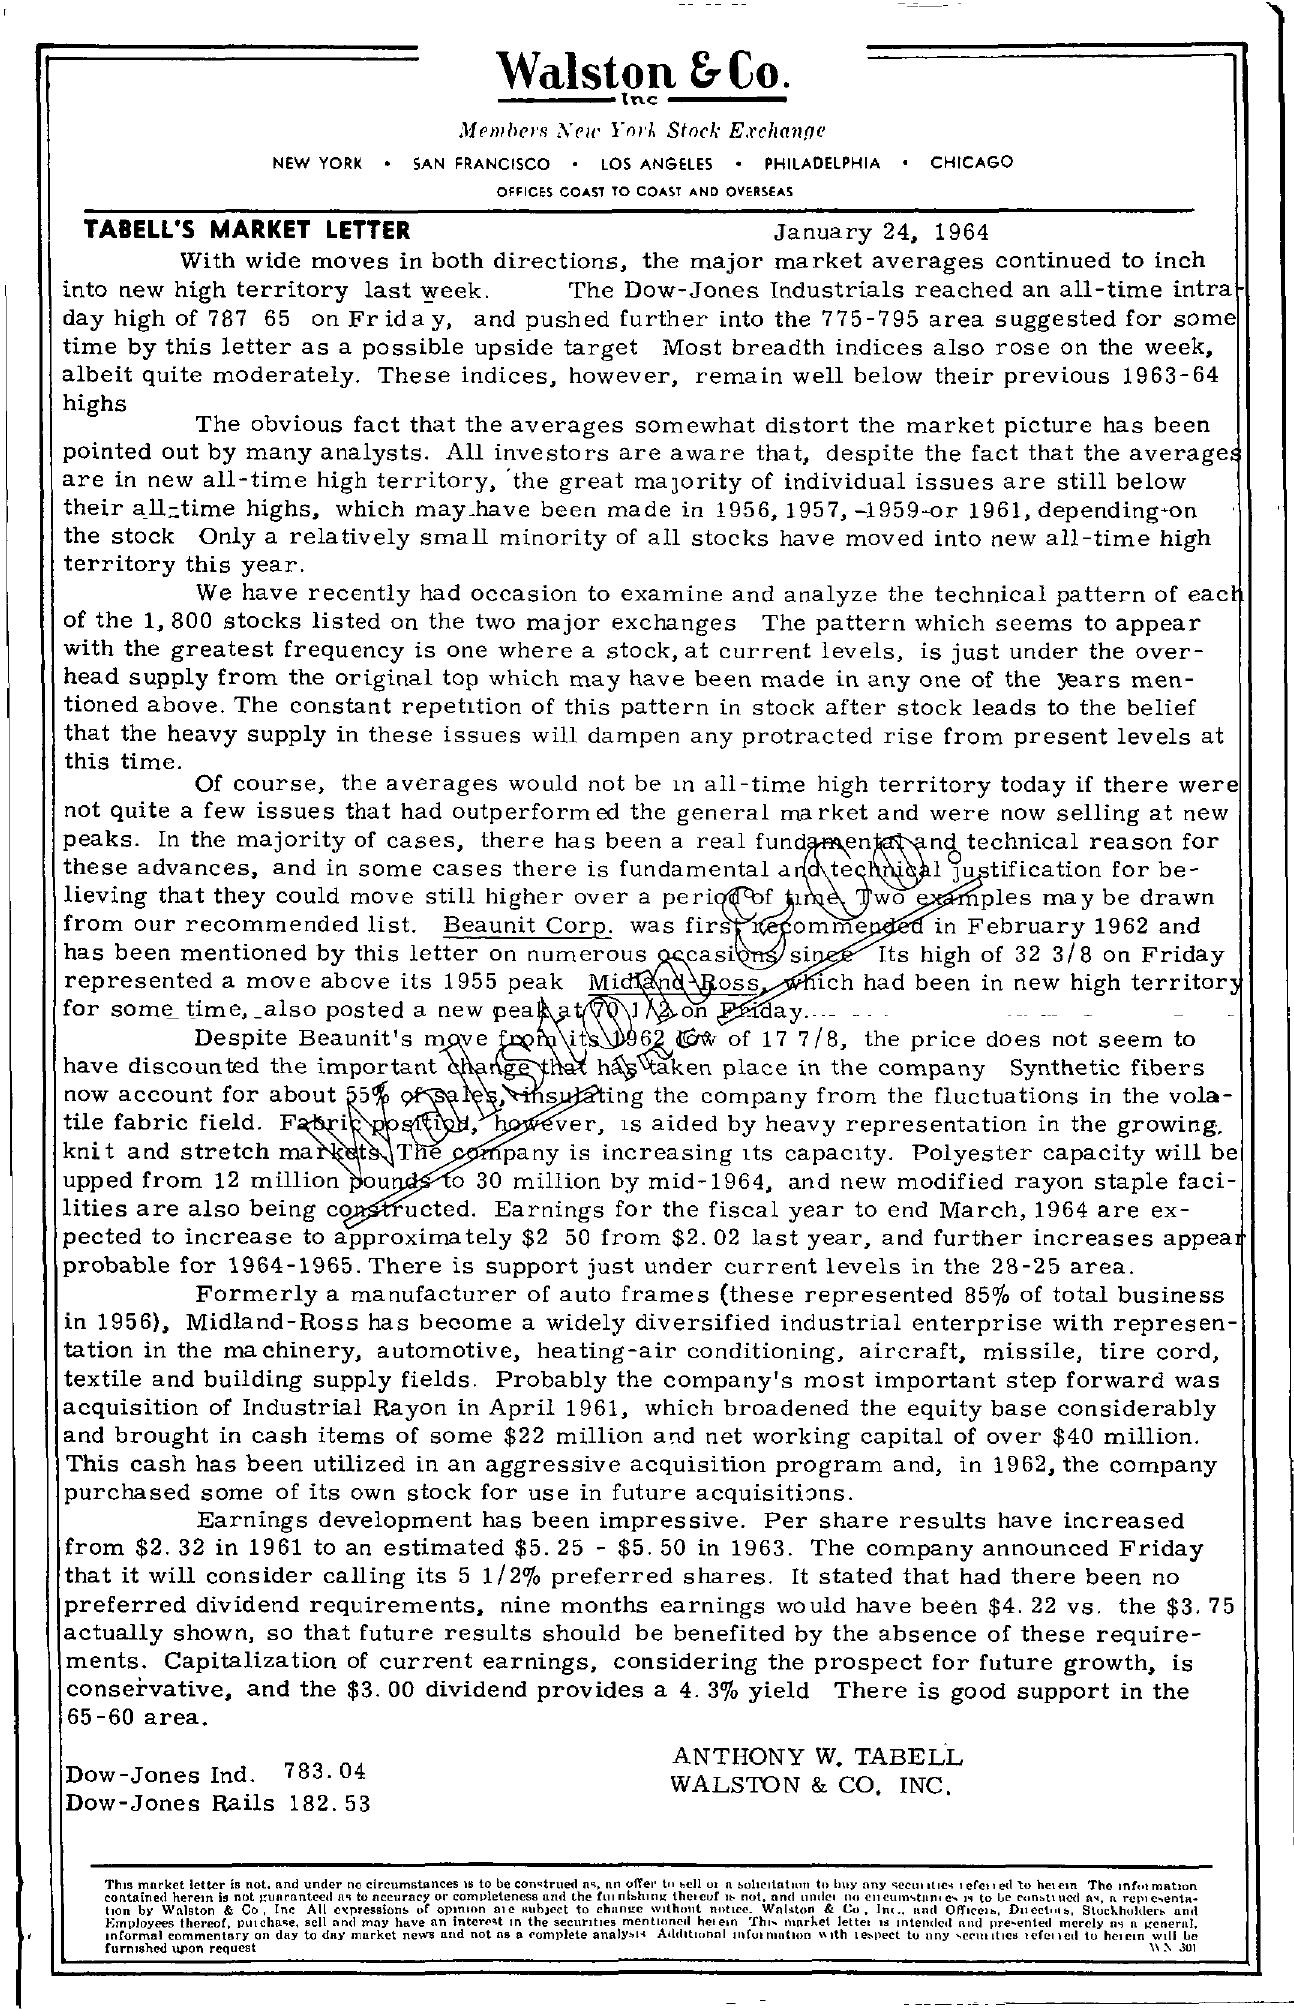 Tabell's Market Letter - January 24, 1964